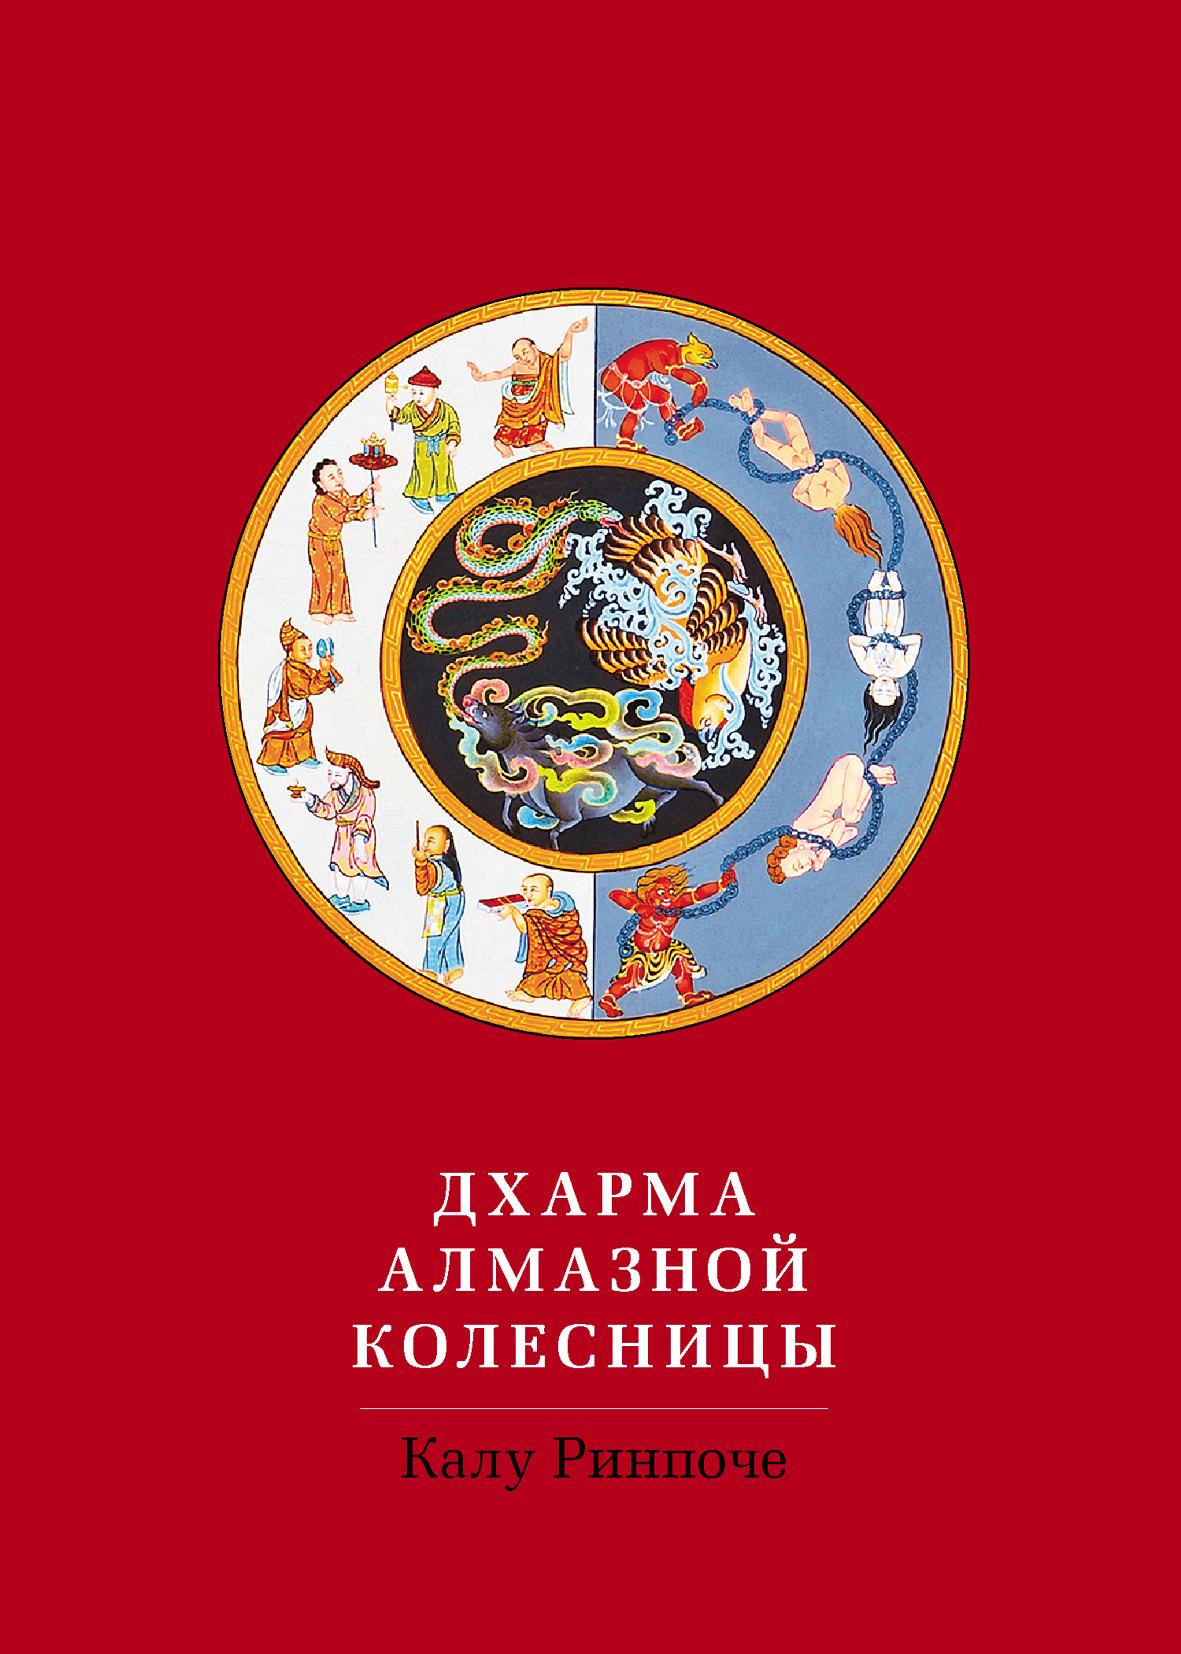 Калу Ринпоче Дхарма Алмазной колесницы калу ринпоче тайный буддизм том iii глубина алмазной колесницы